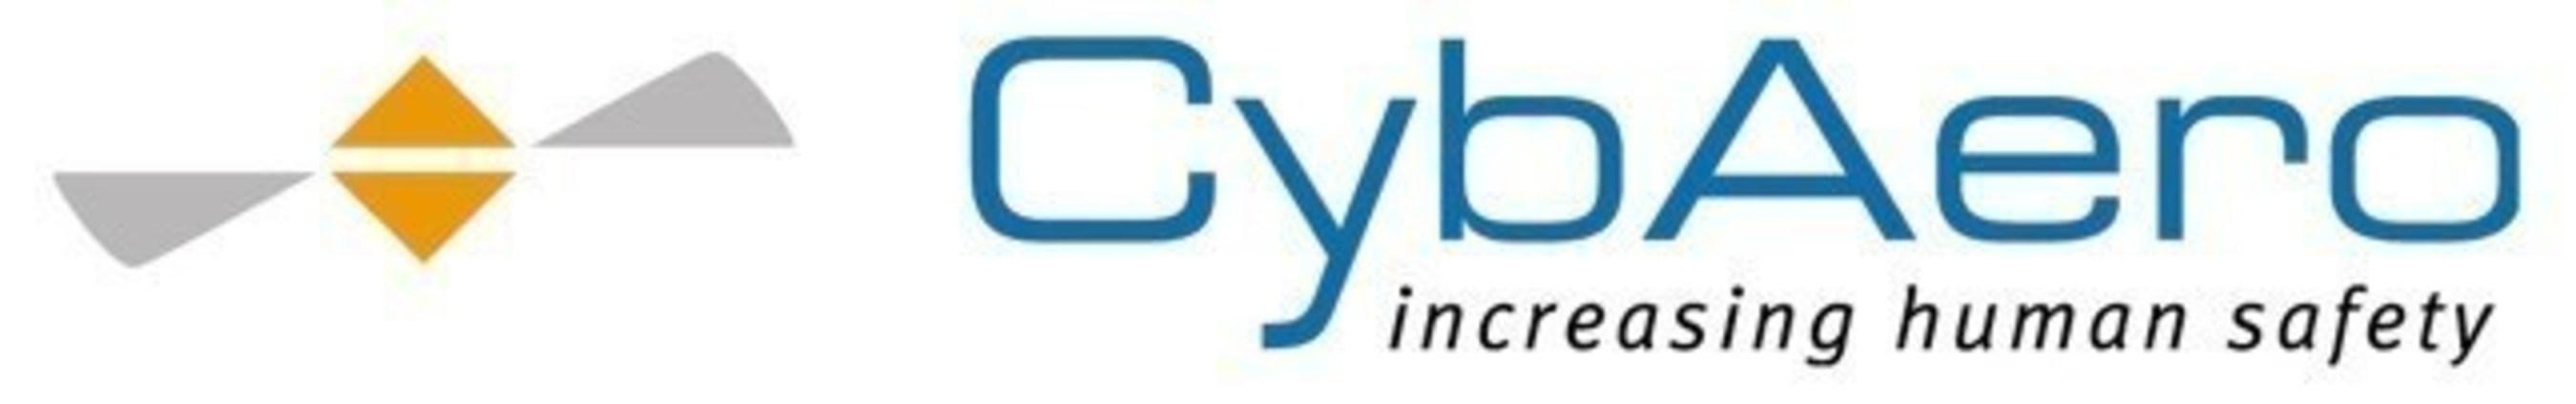 CybAero Increasing human safety